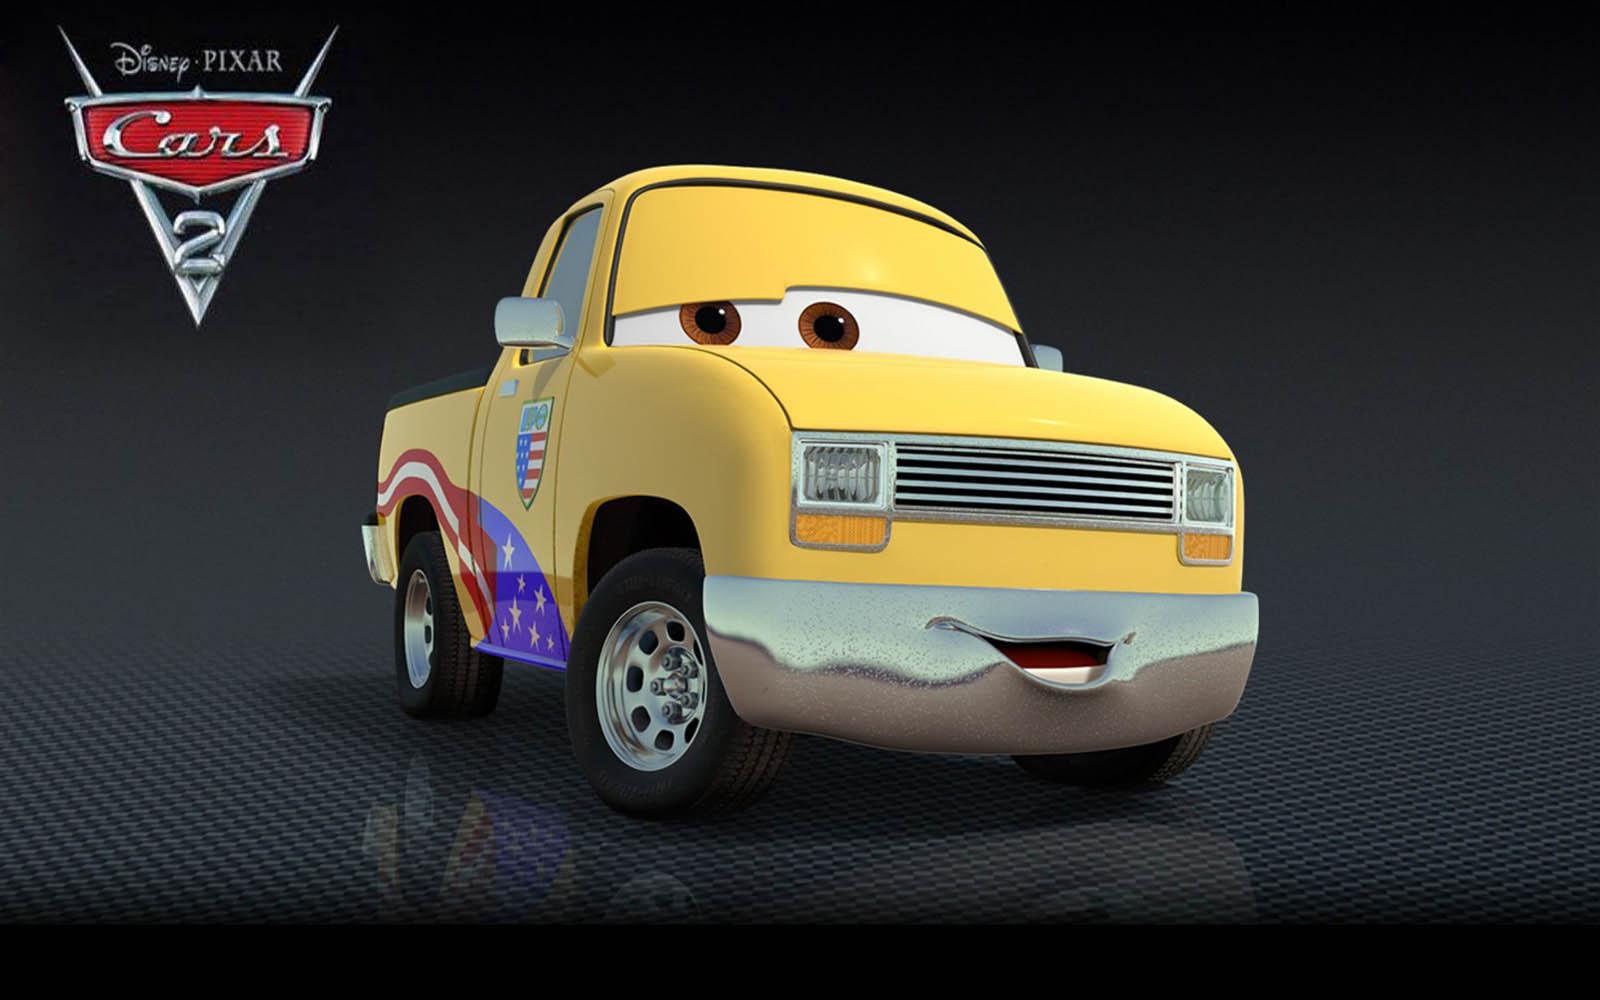 http://3.bp.blogspot.com/-z4NRqdlup48/UFwshYgV-rI/AAAAAAAAKKA/DOmh0x8y_XI/s1600/Cars+2+Wallpapers+8.jpg